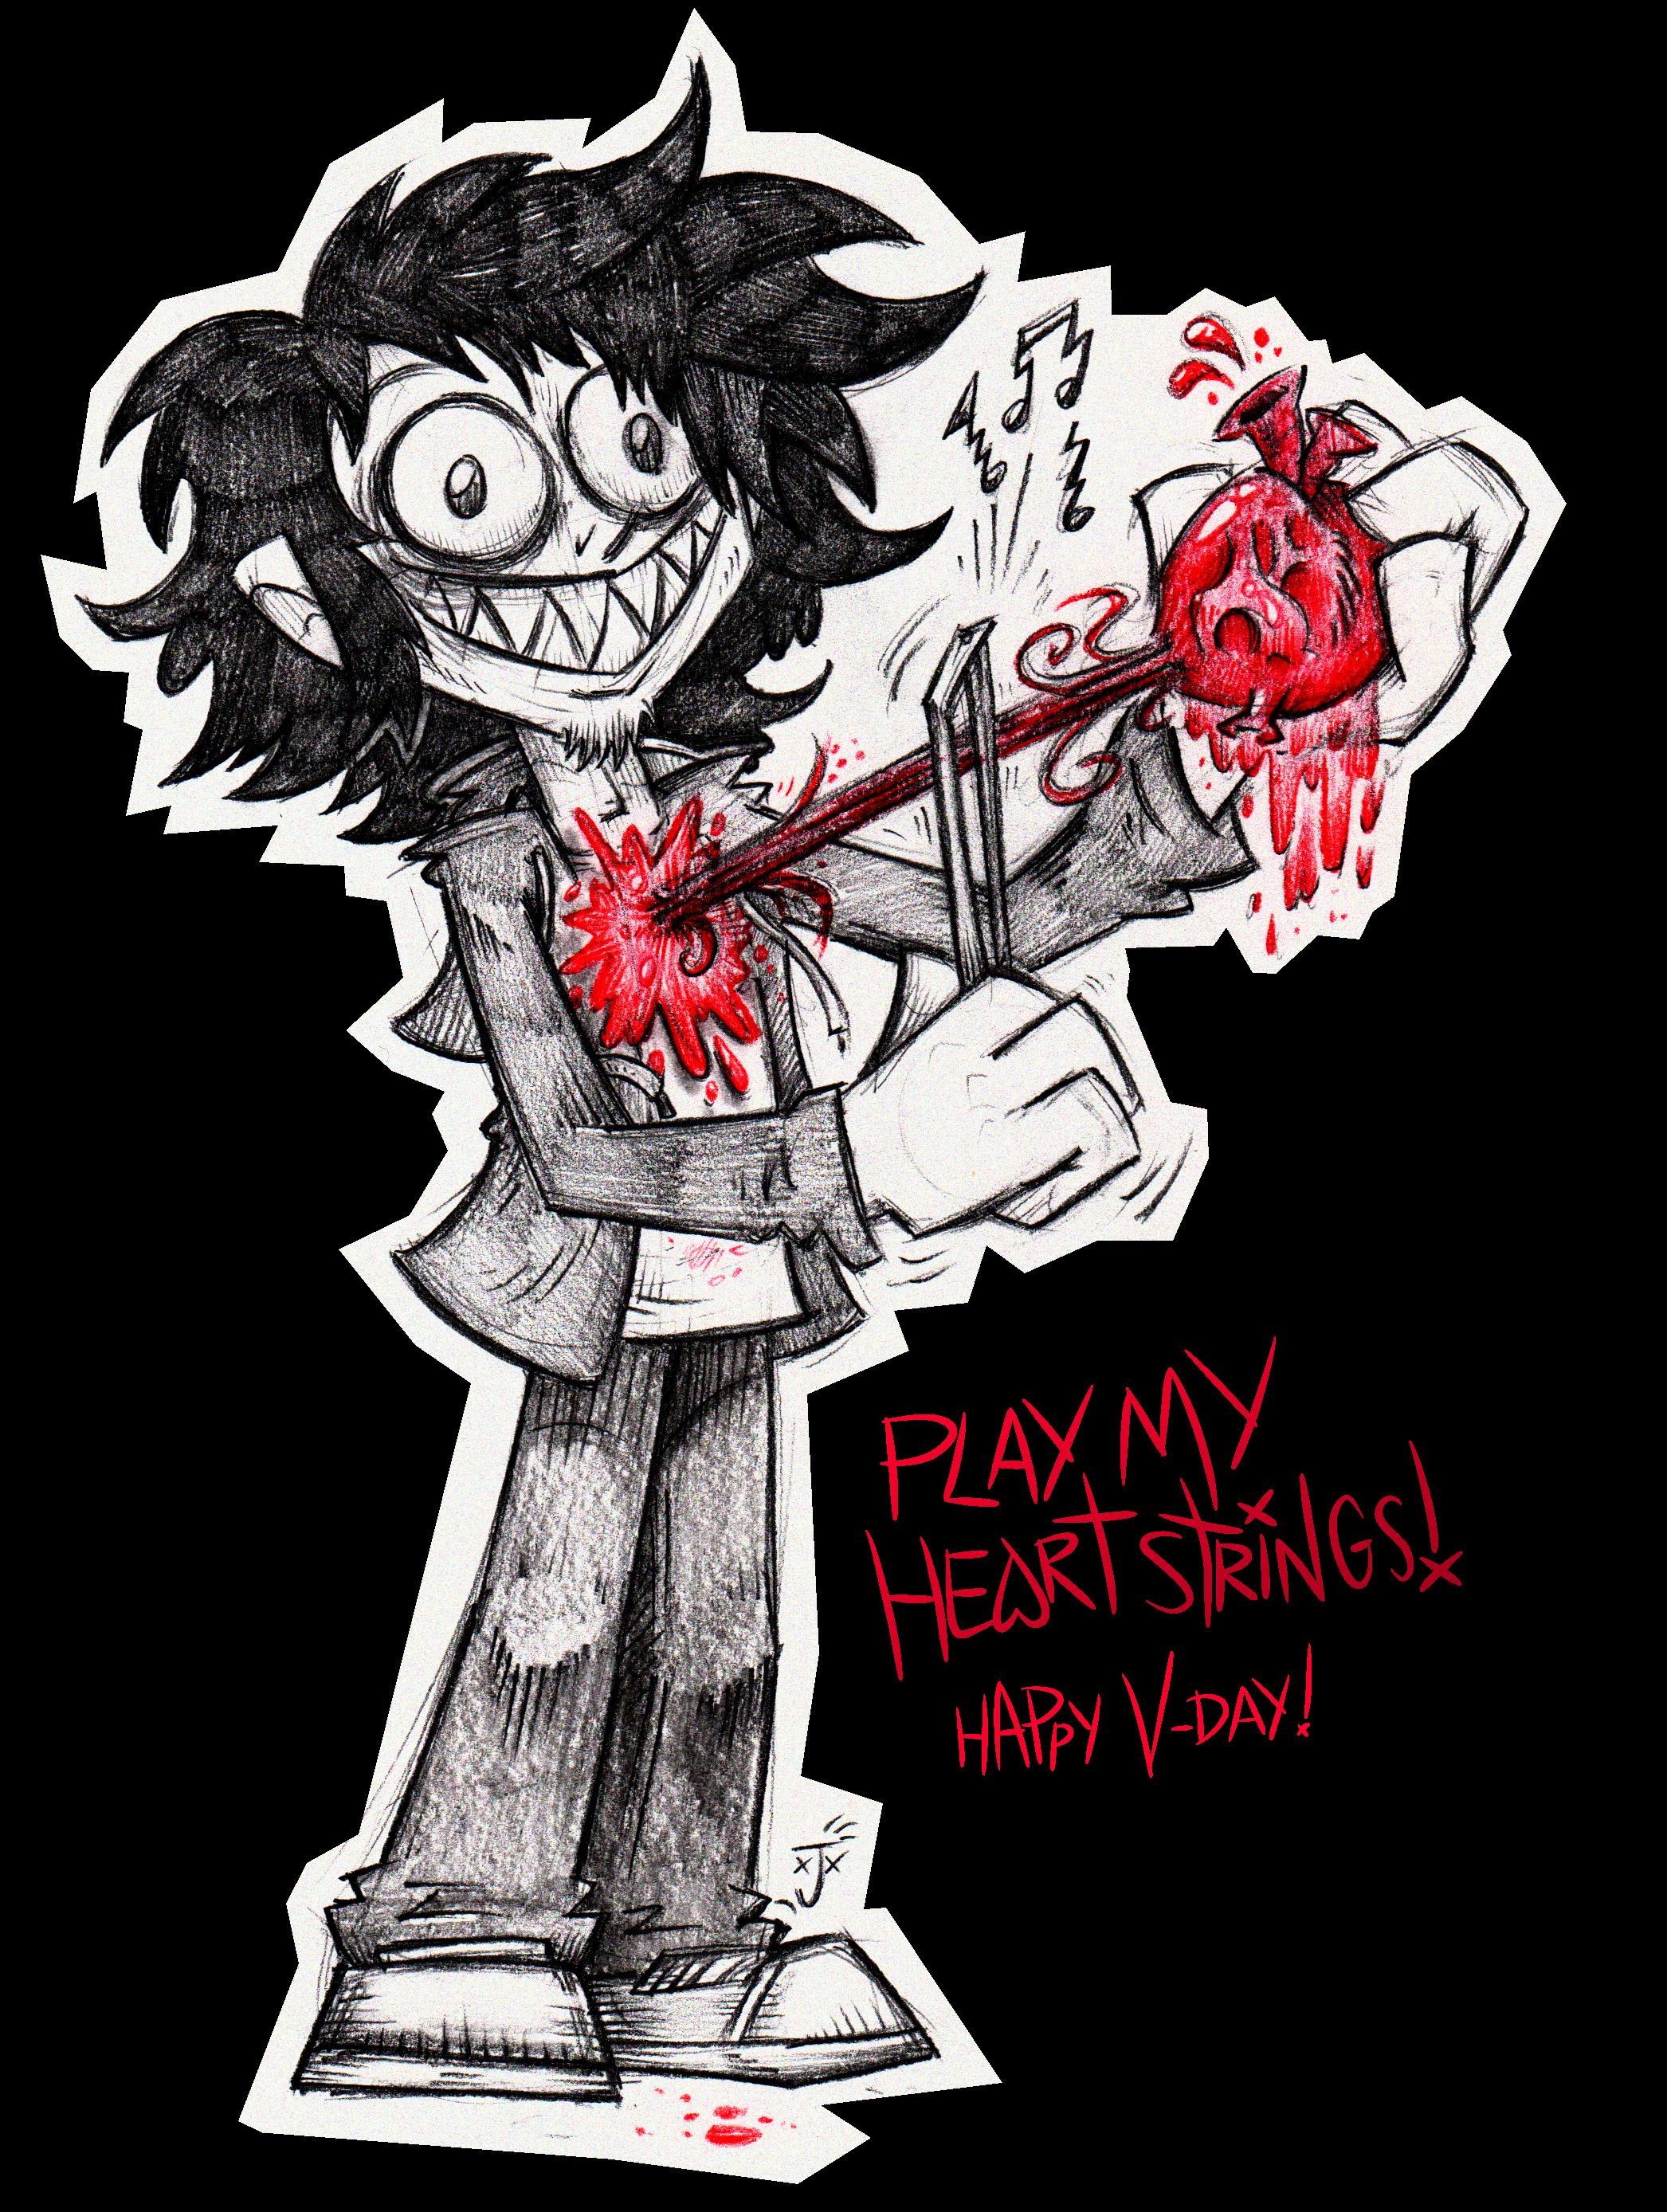 Play My Heartstrings! V-DAY CARD